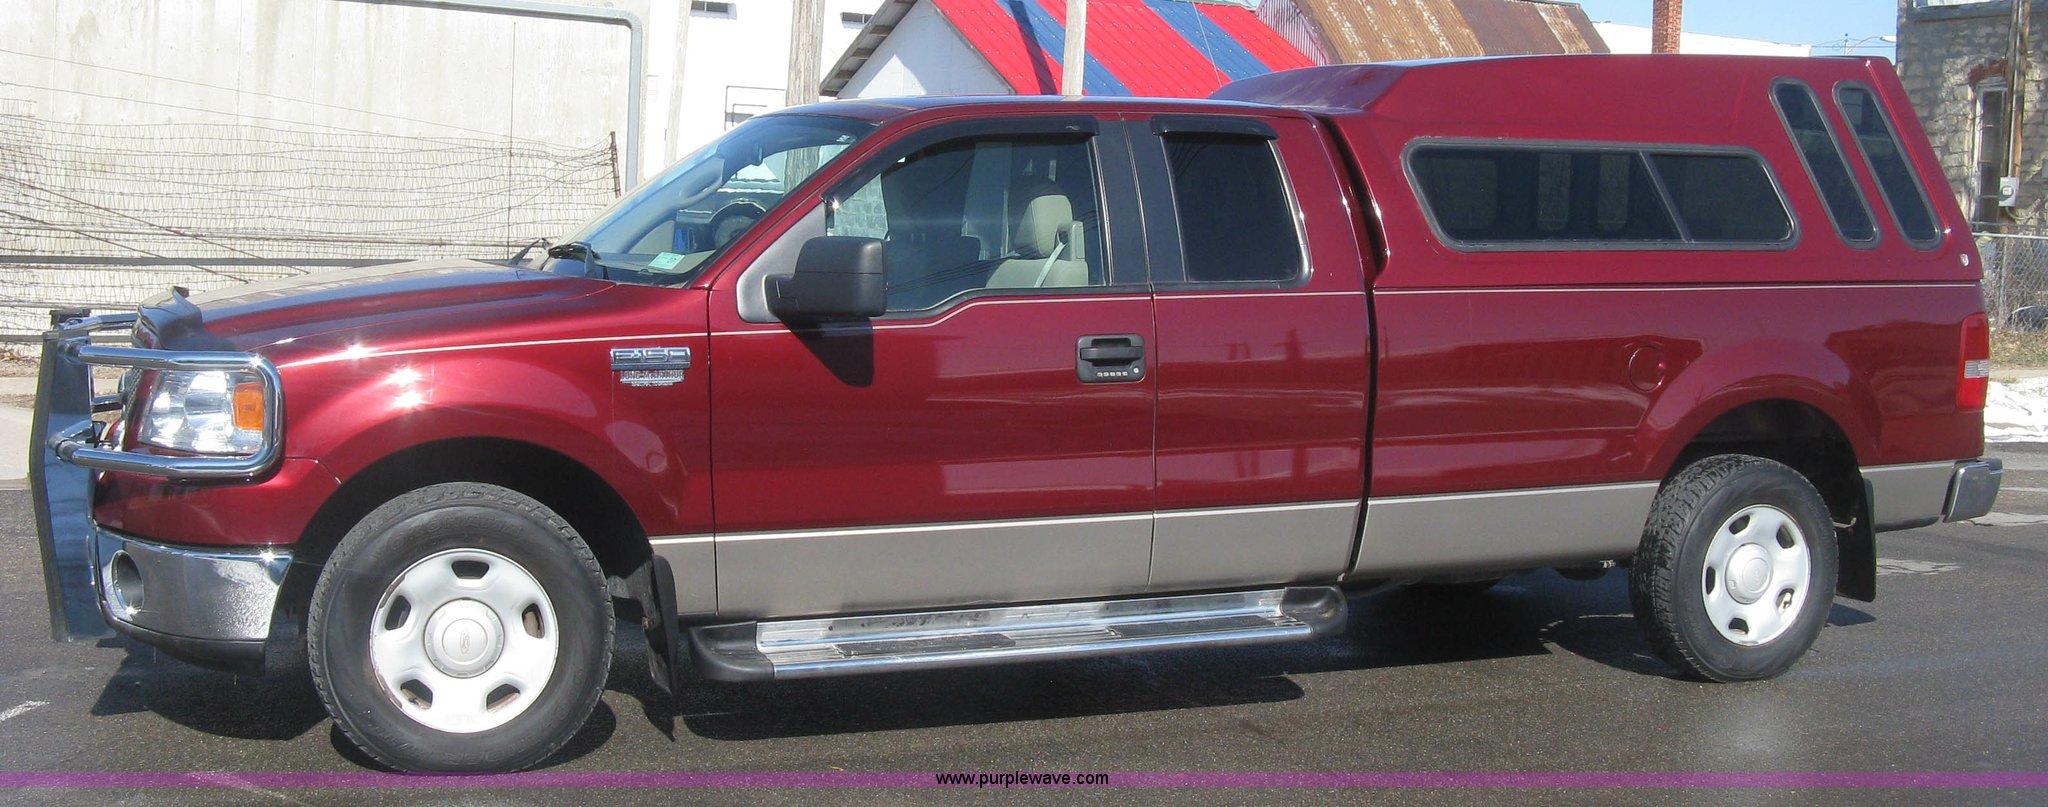 2006 Ford F150 Xlt Supercab Pickup Truck Item K2875 Sold F 150 Super Duty Full Size In New Window